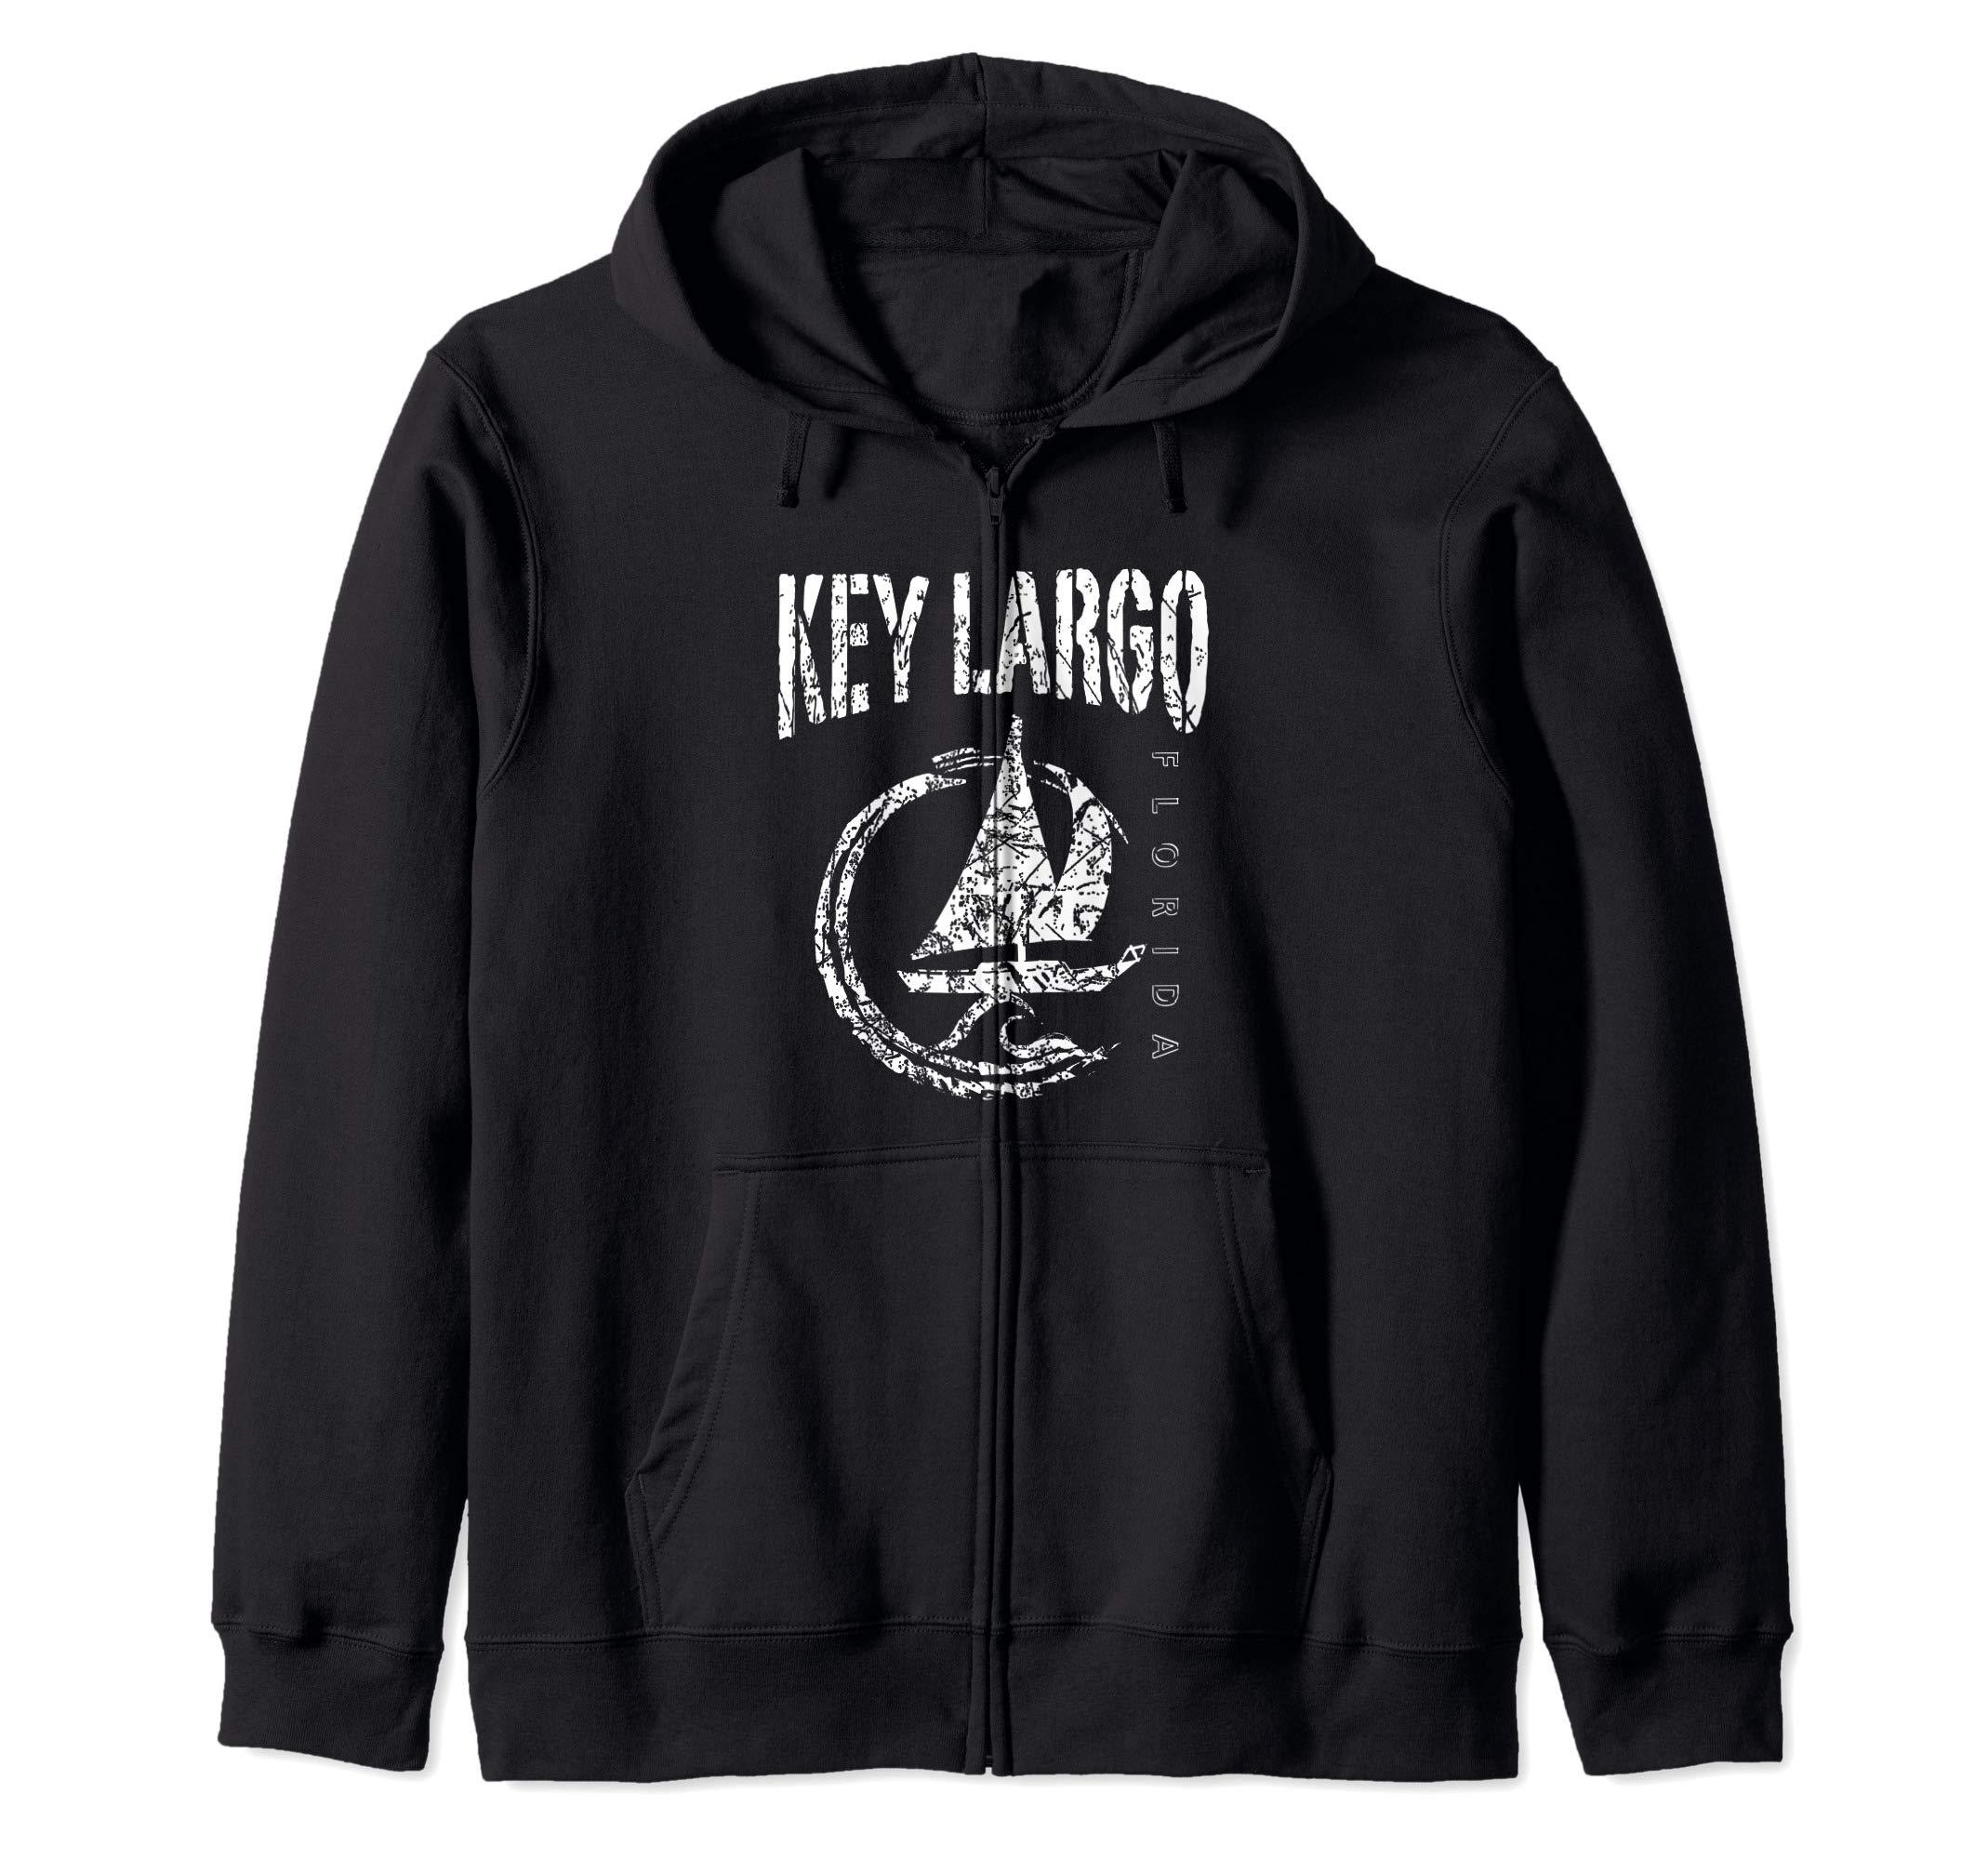 Key Largo Florida Souvenir, Sailboat Sailing Zip Hoodie by KEY LARGO Souvenir Gift Florida Sailing FL